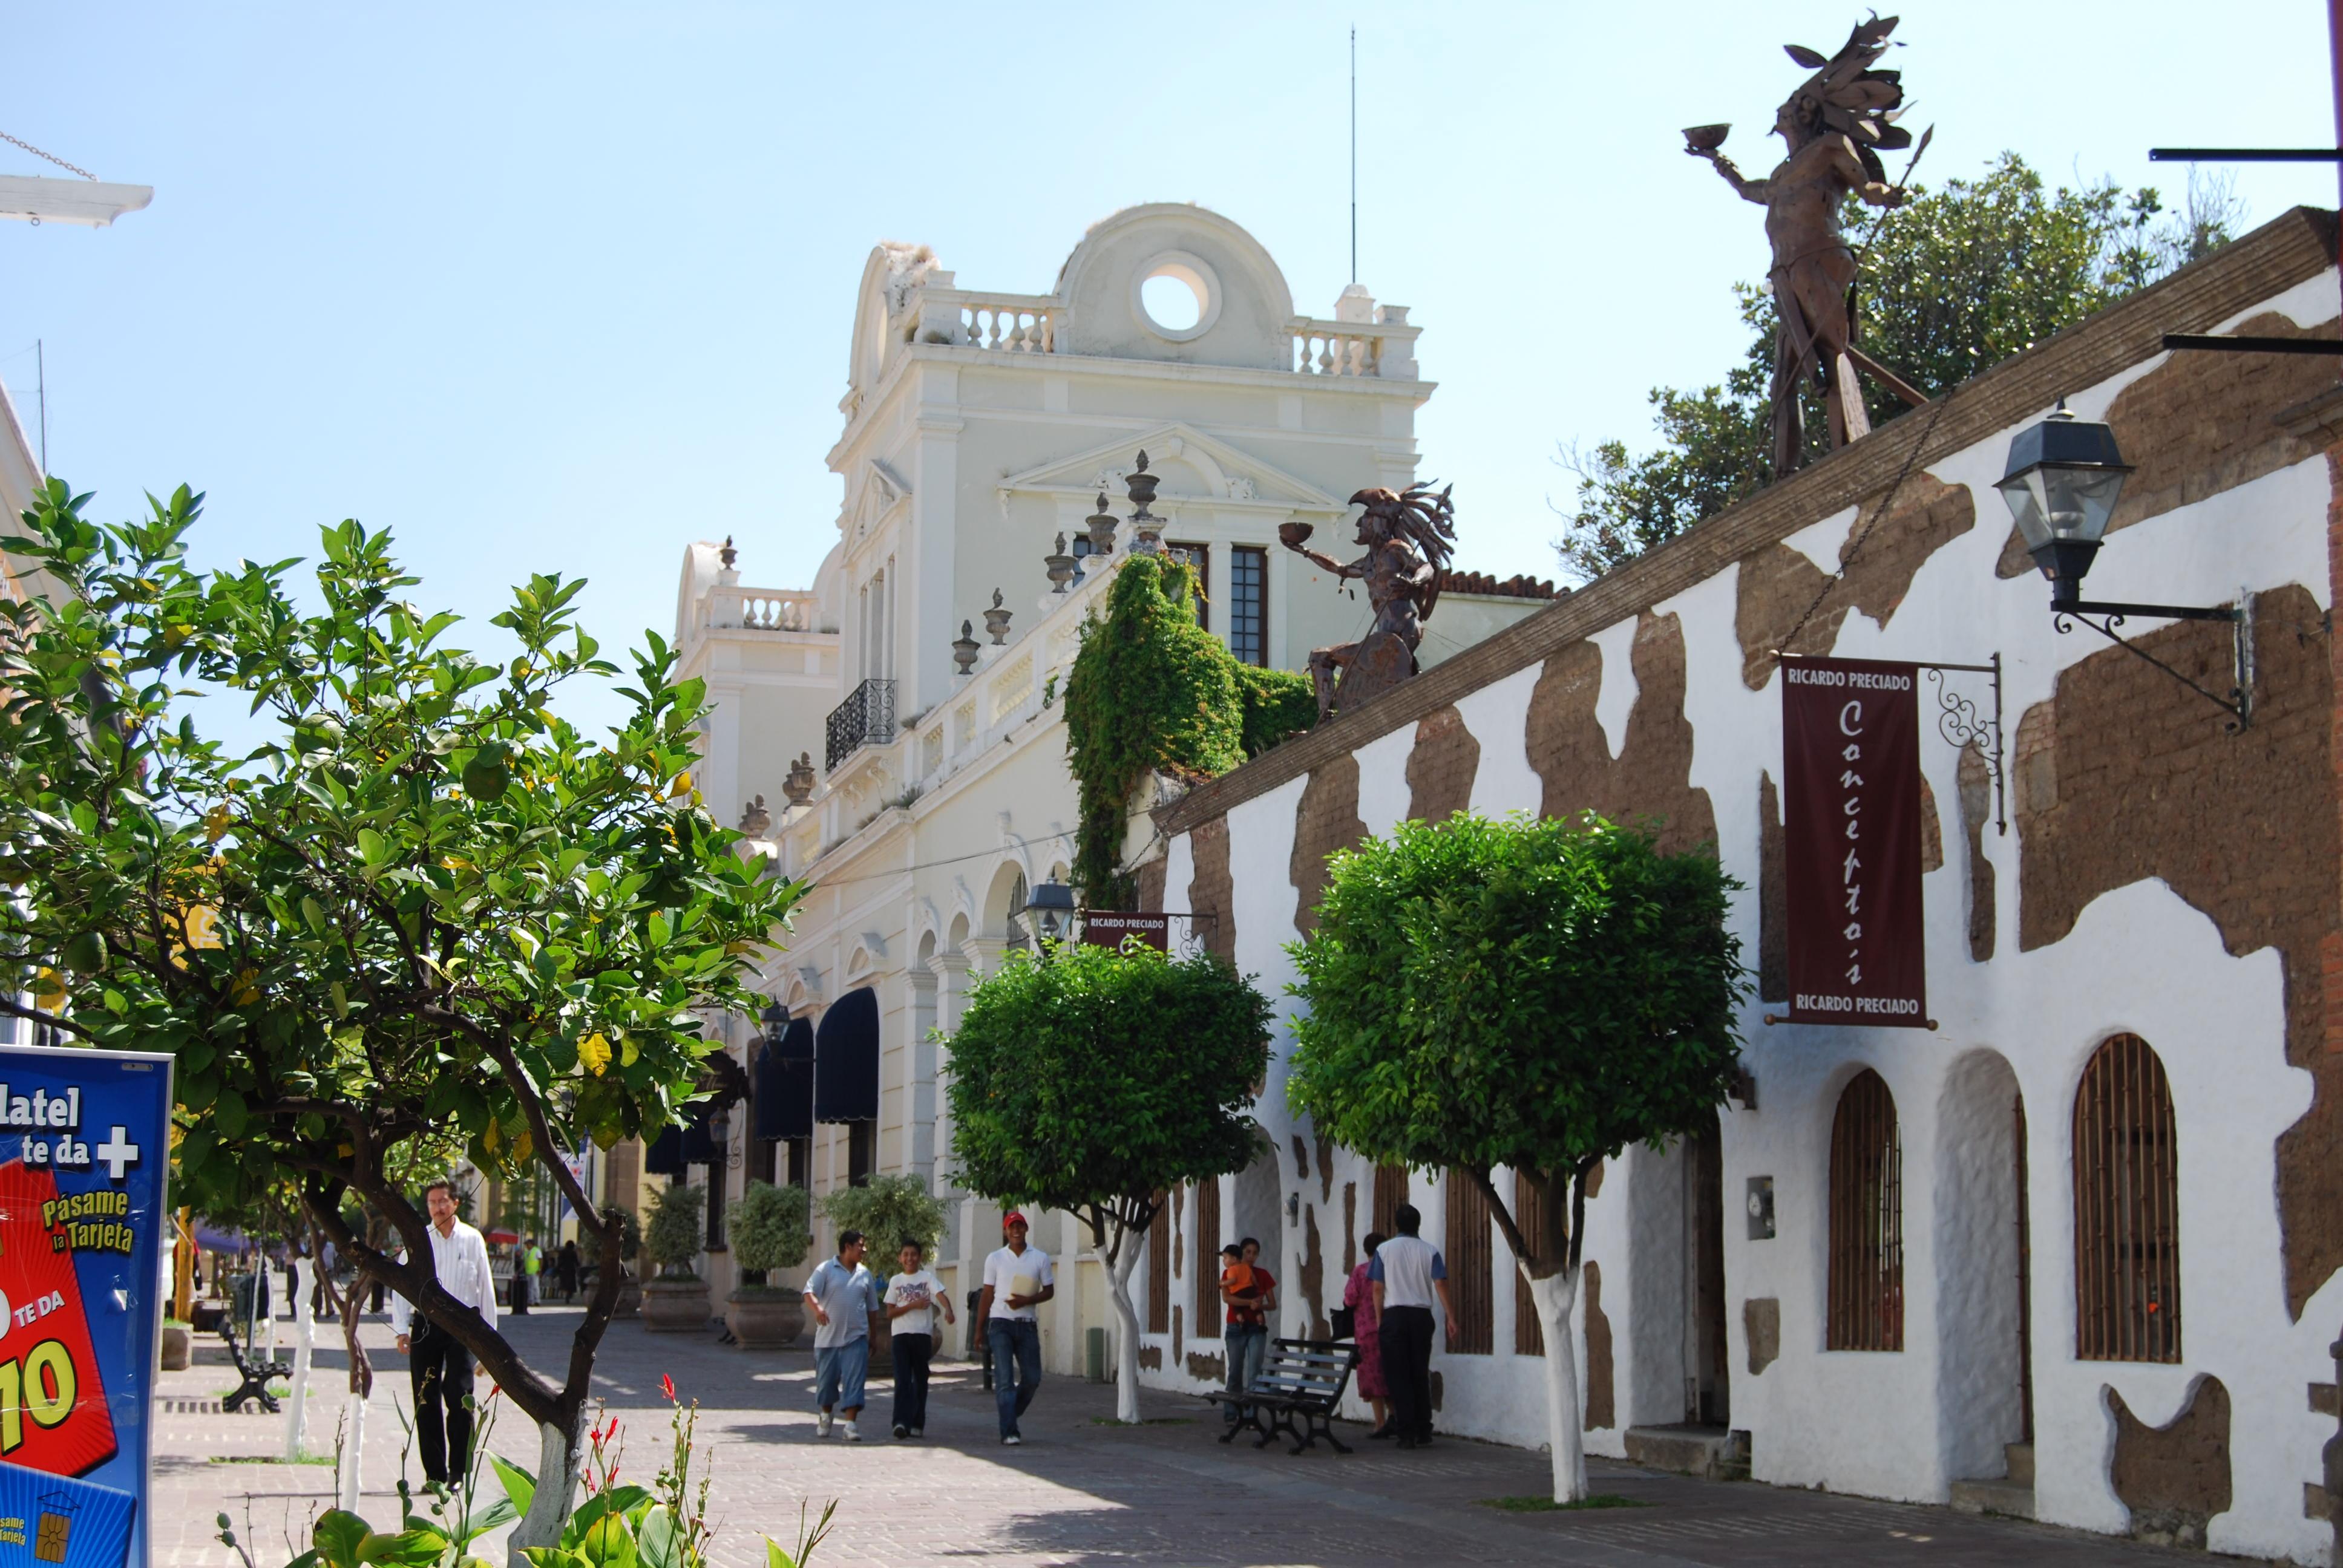 Guadalajara Jalisco Mexico